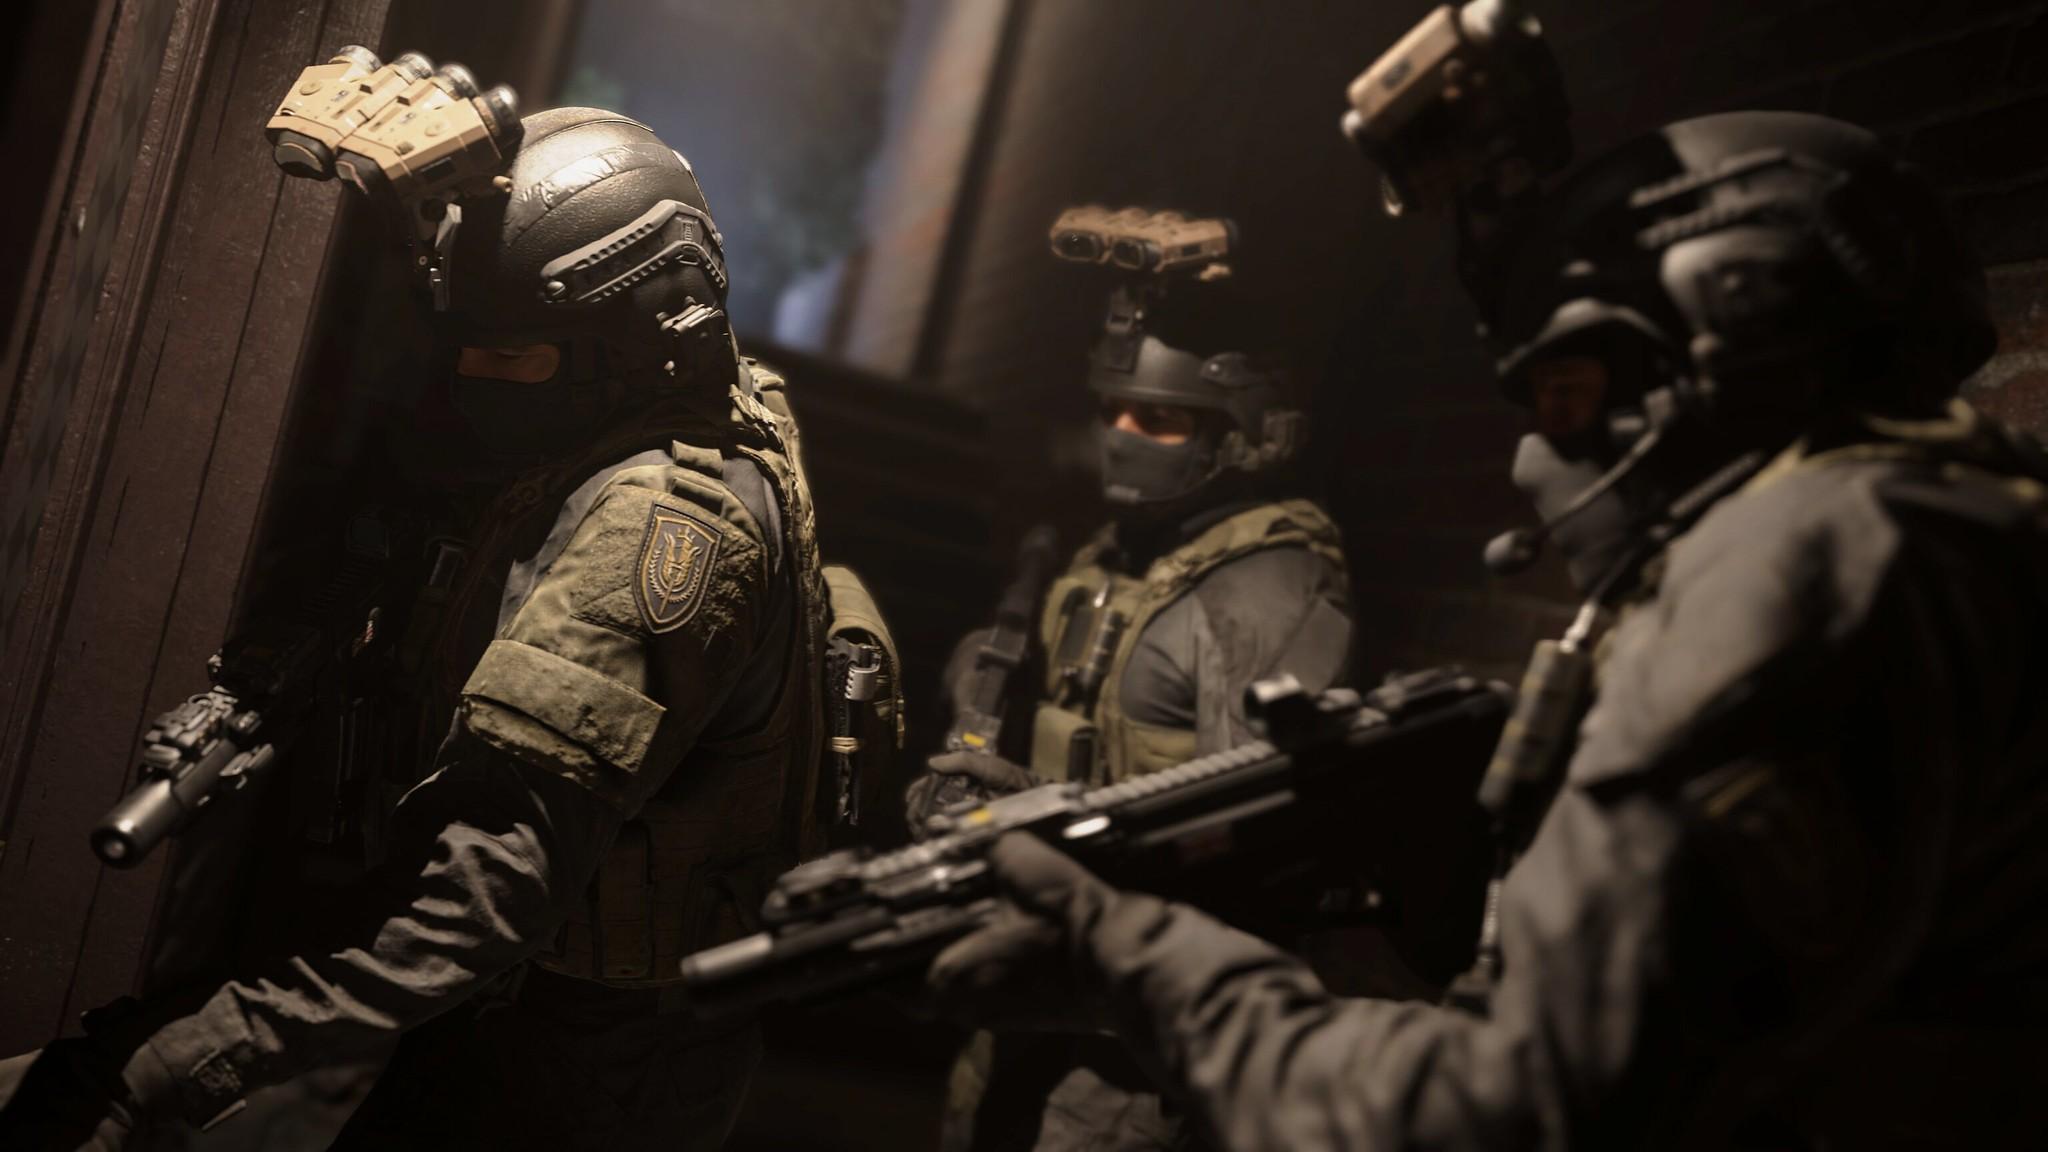 Кадр из игры Call of Duty: Modern Warfare